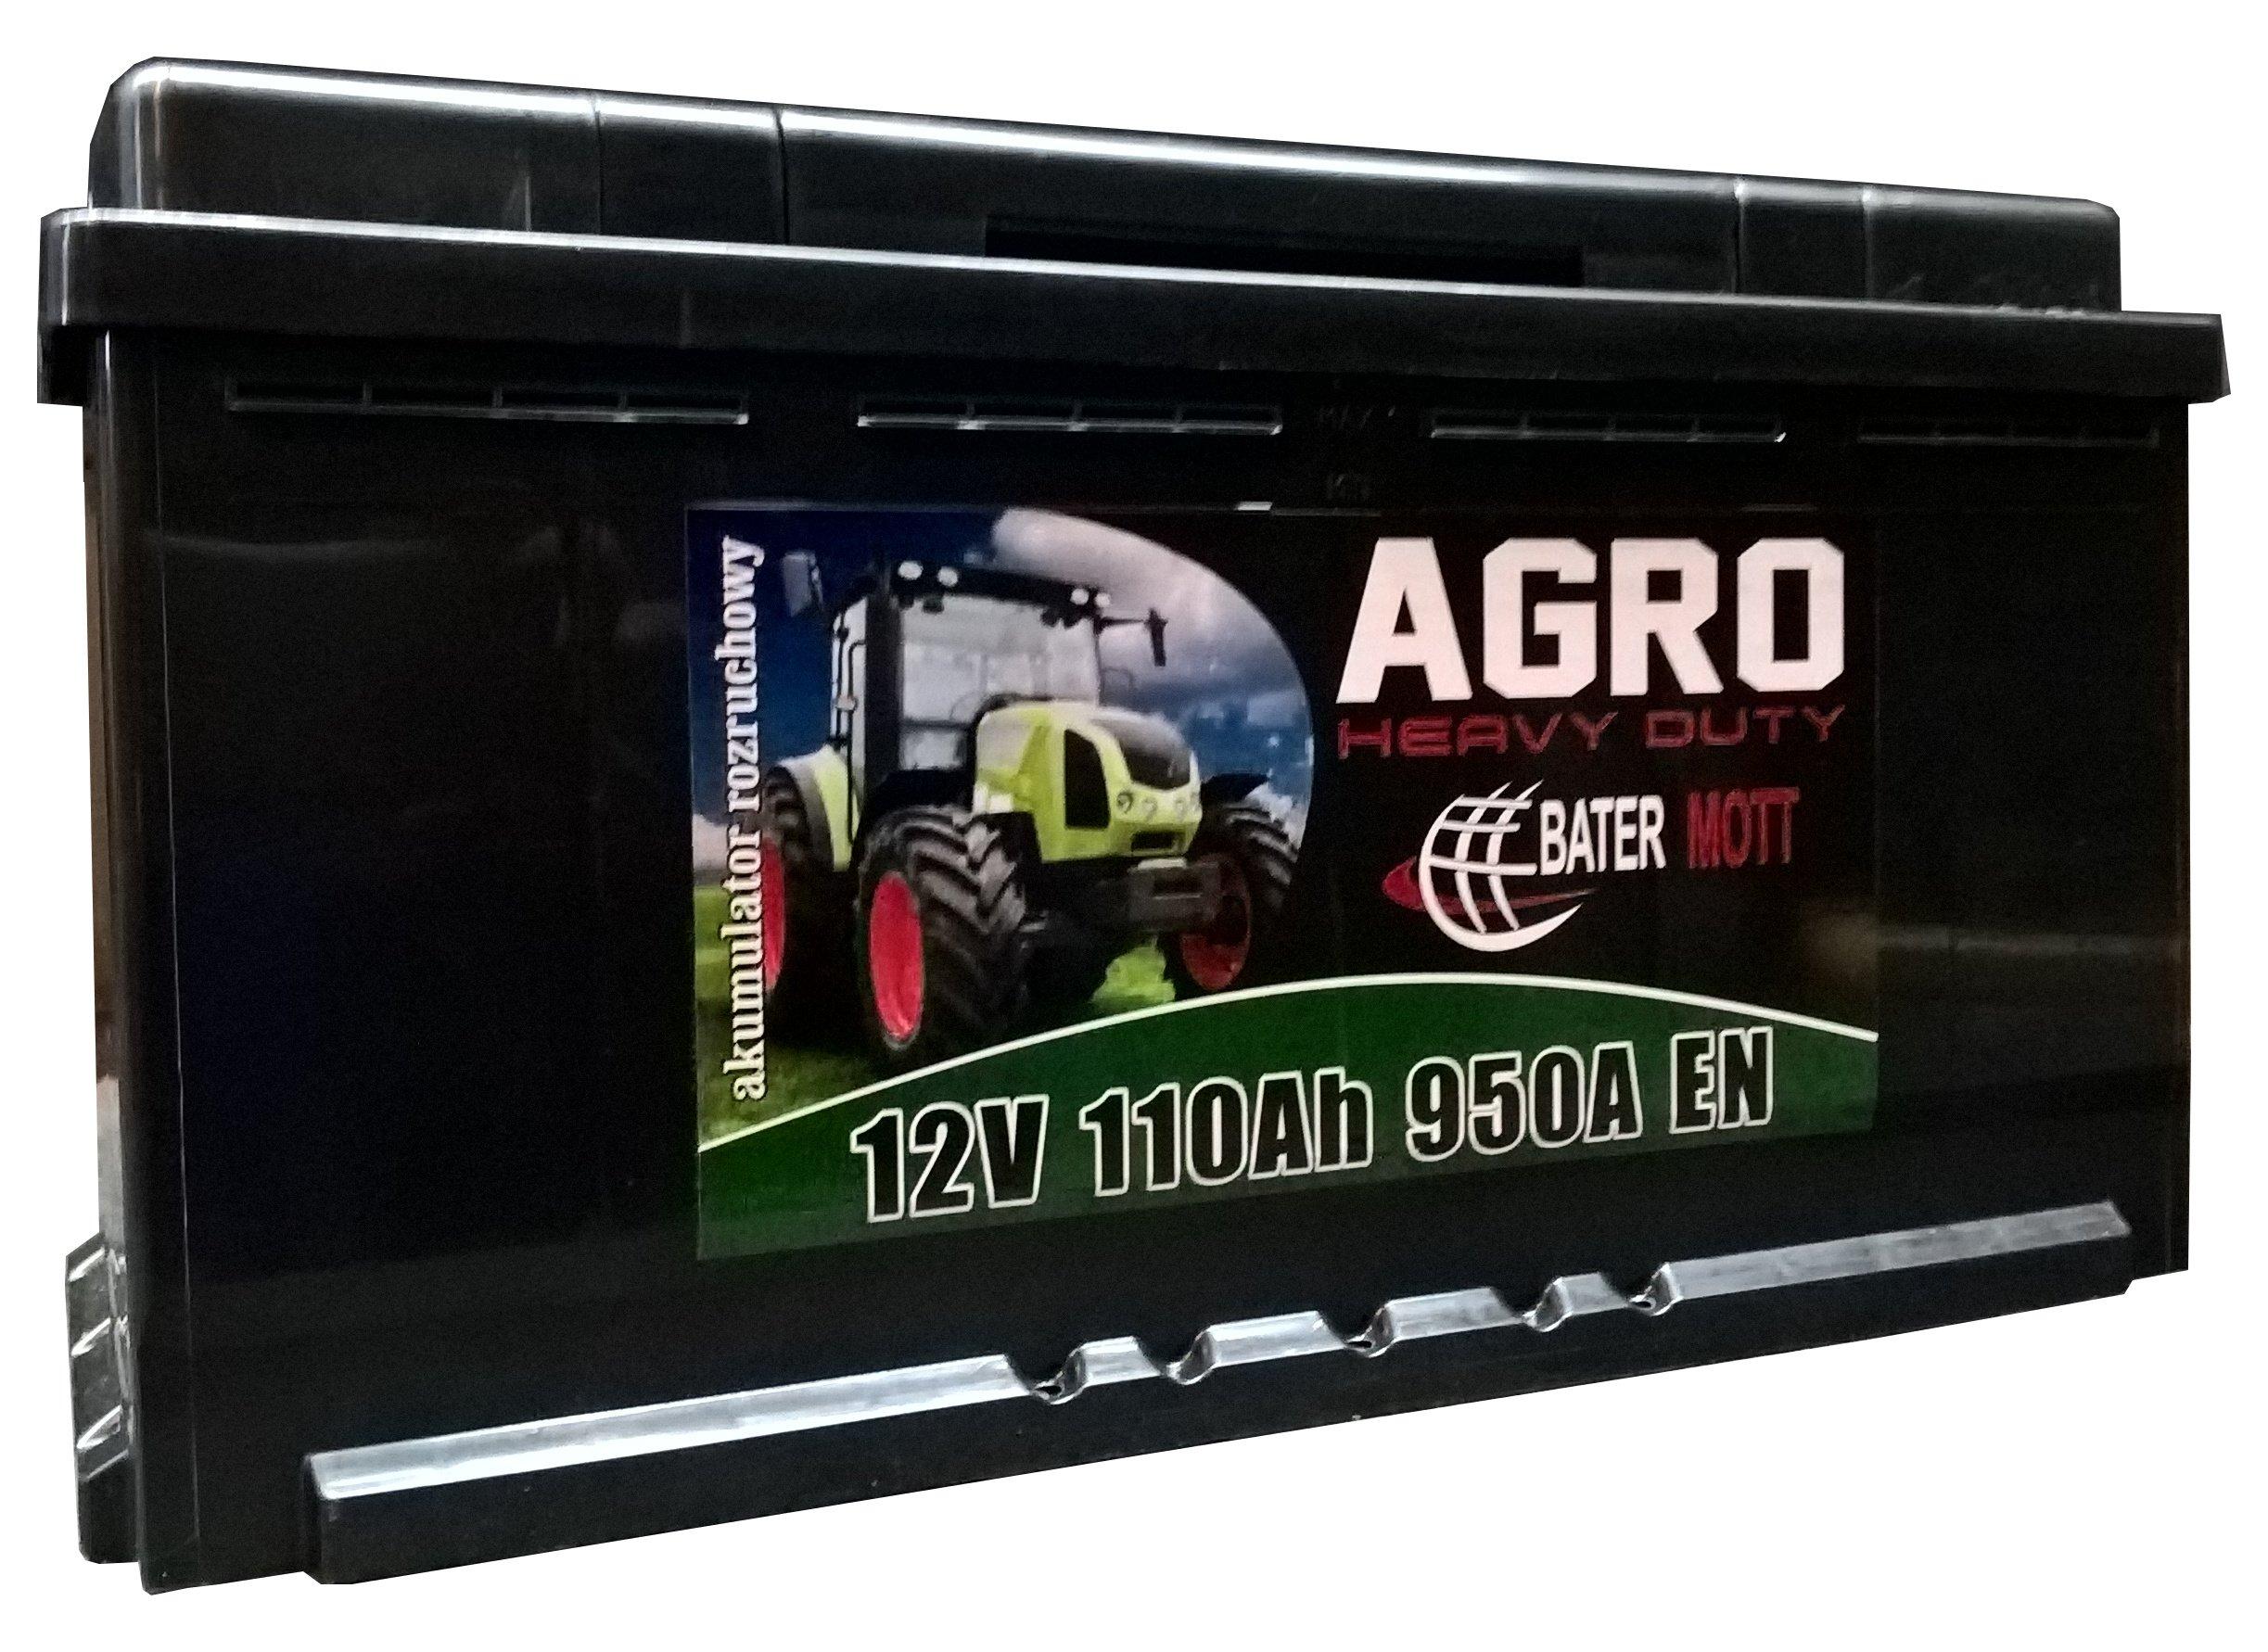 аккумулятор battermott агро 12v 110ah 950a